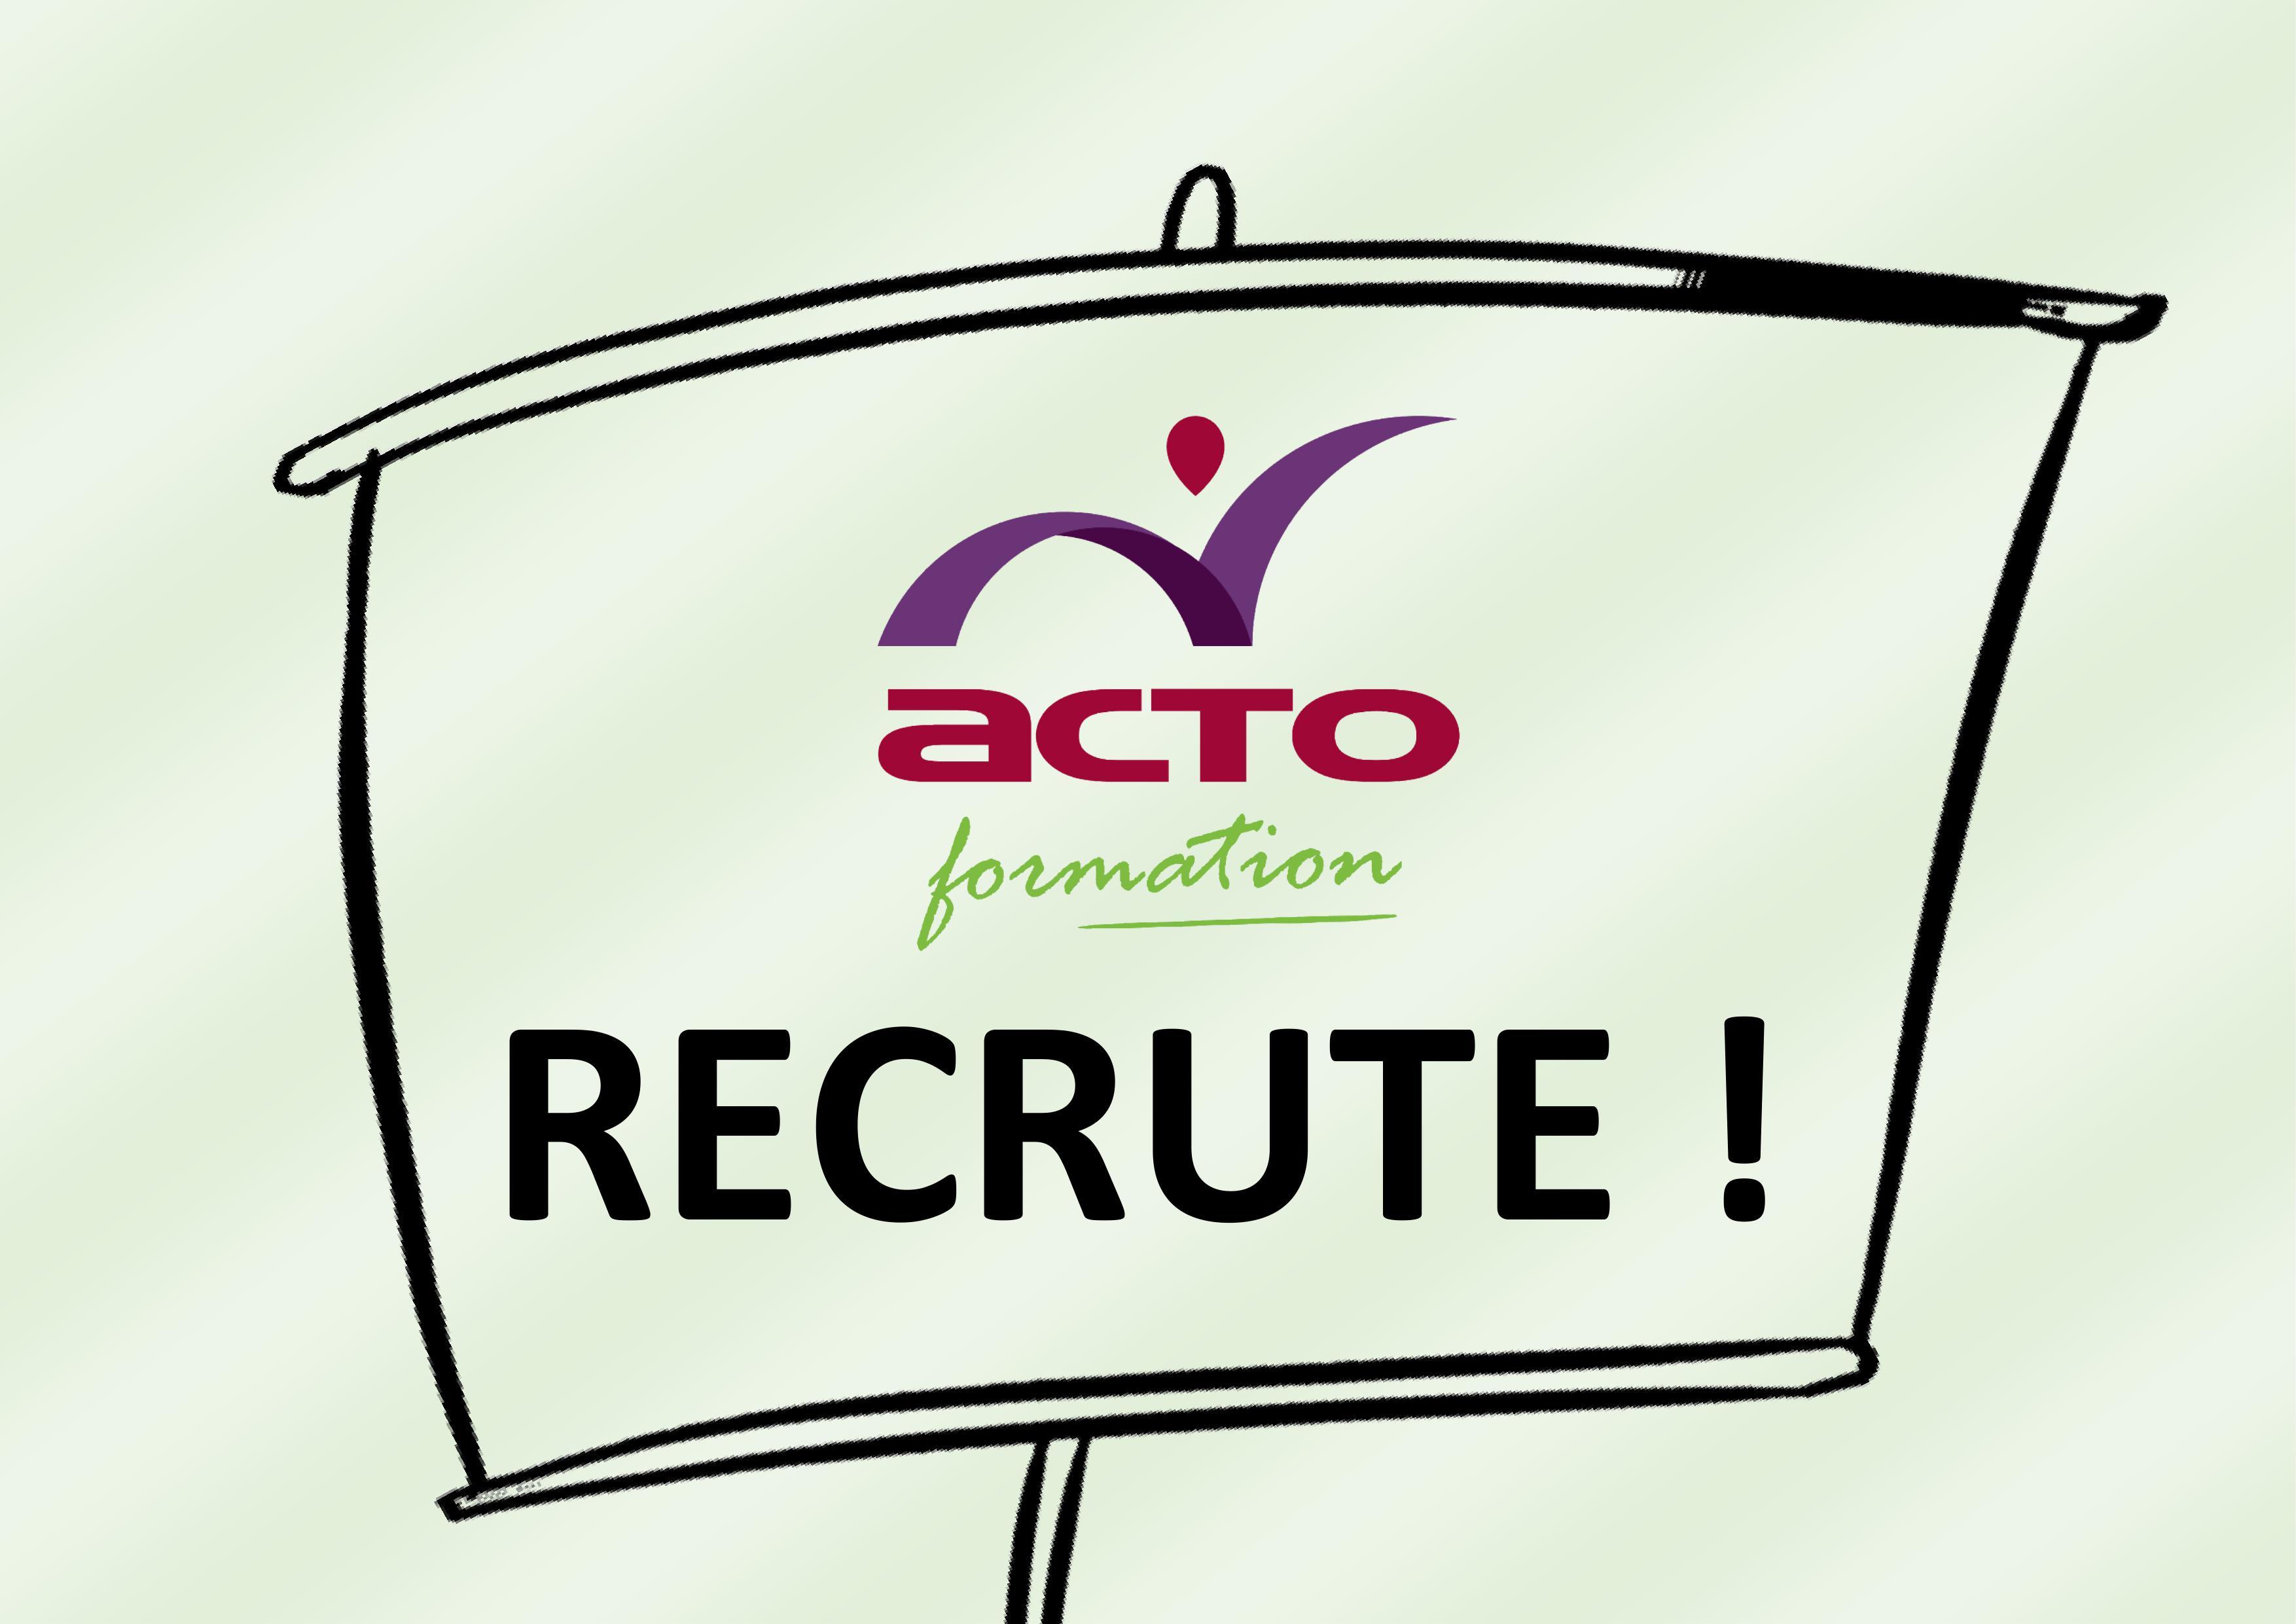 ACTO FORMATION RECRUTE